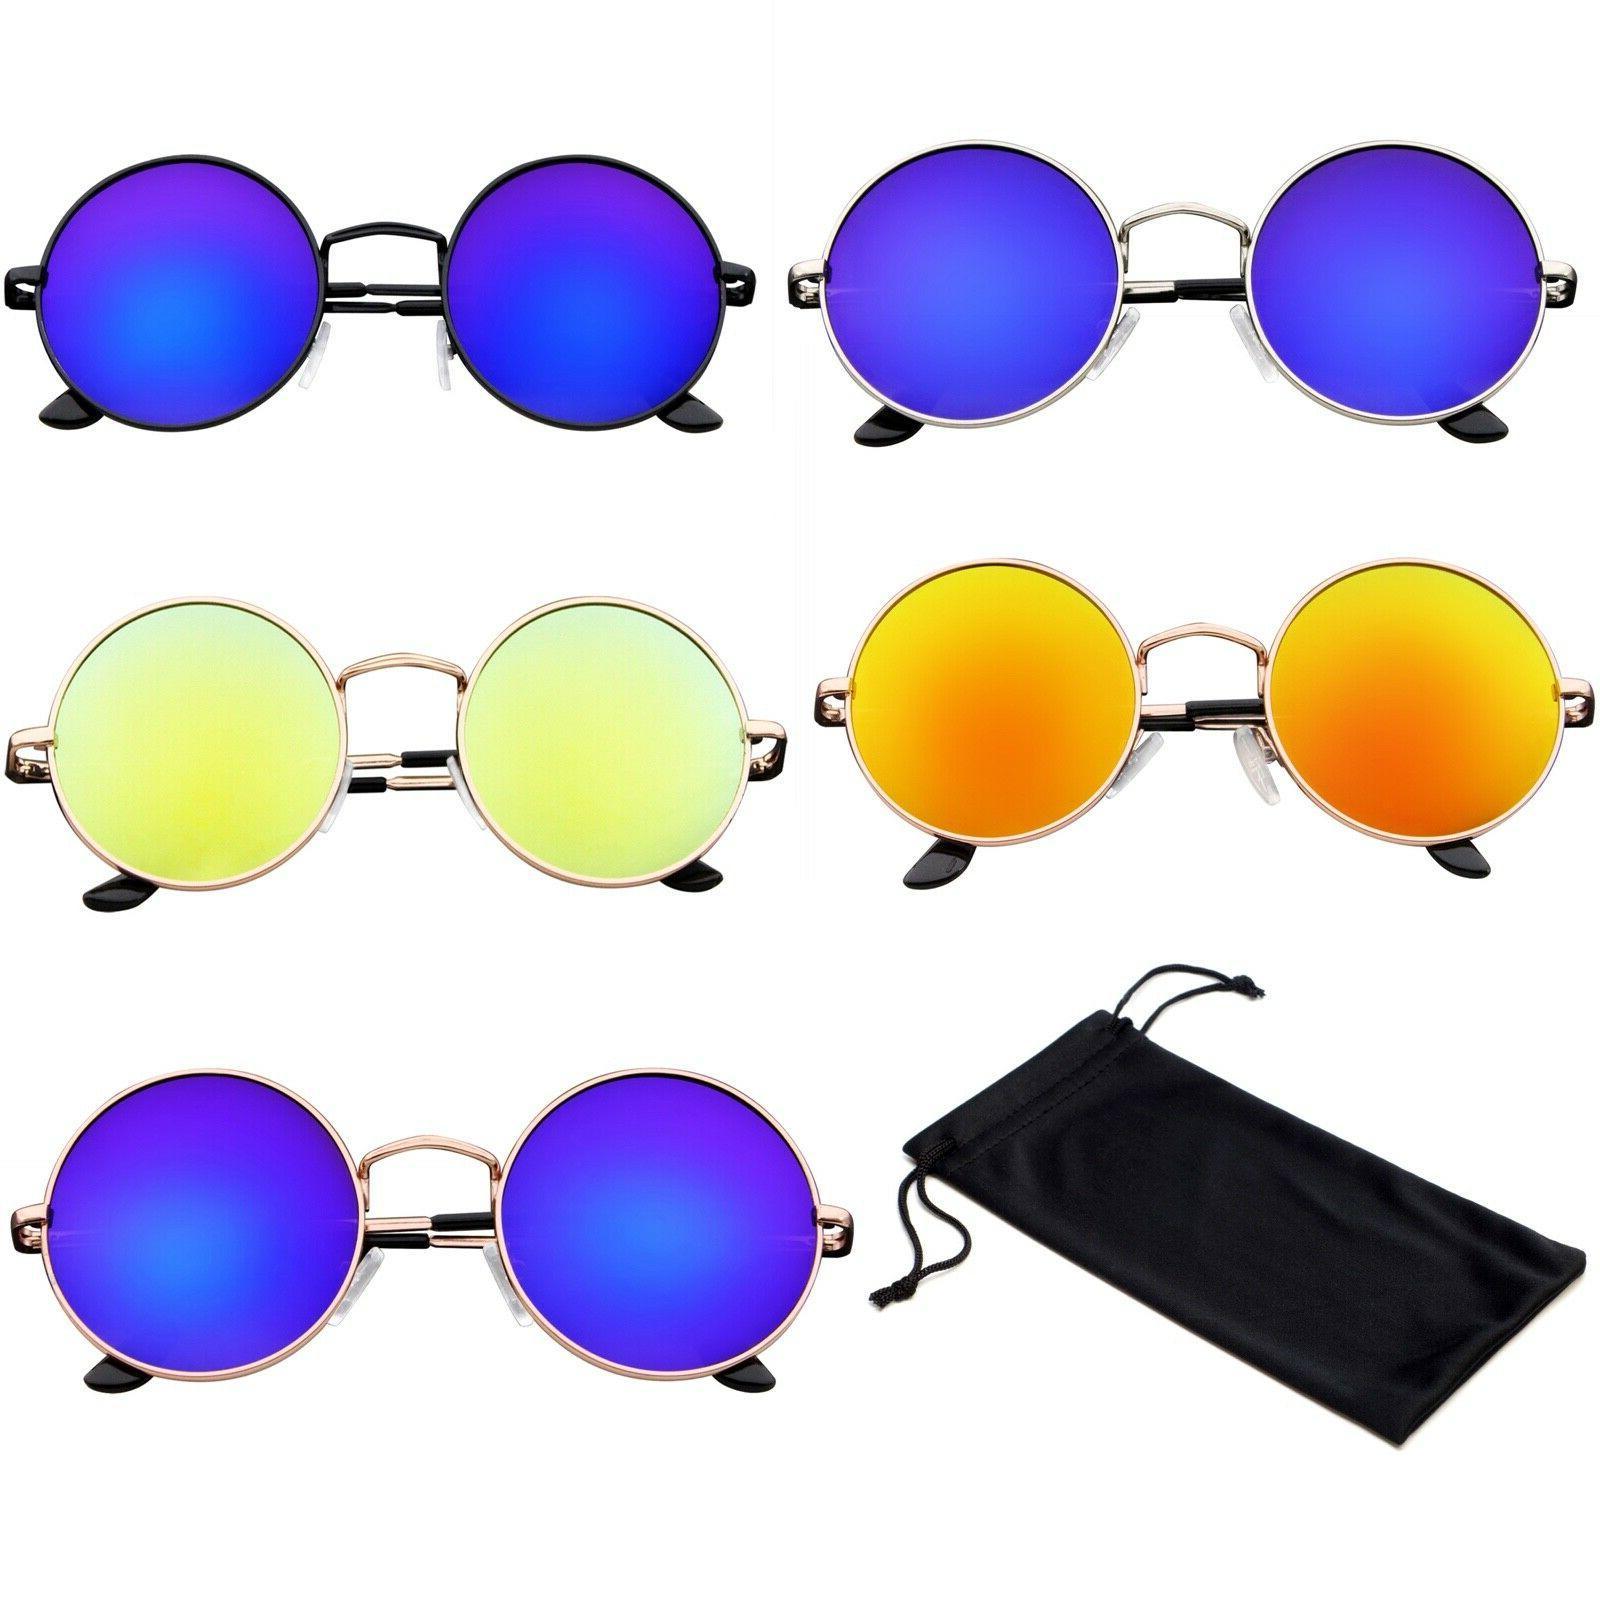 john lennon sunglasses round sunglasses retro vintage